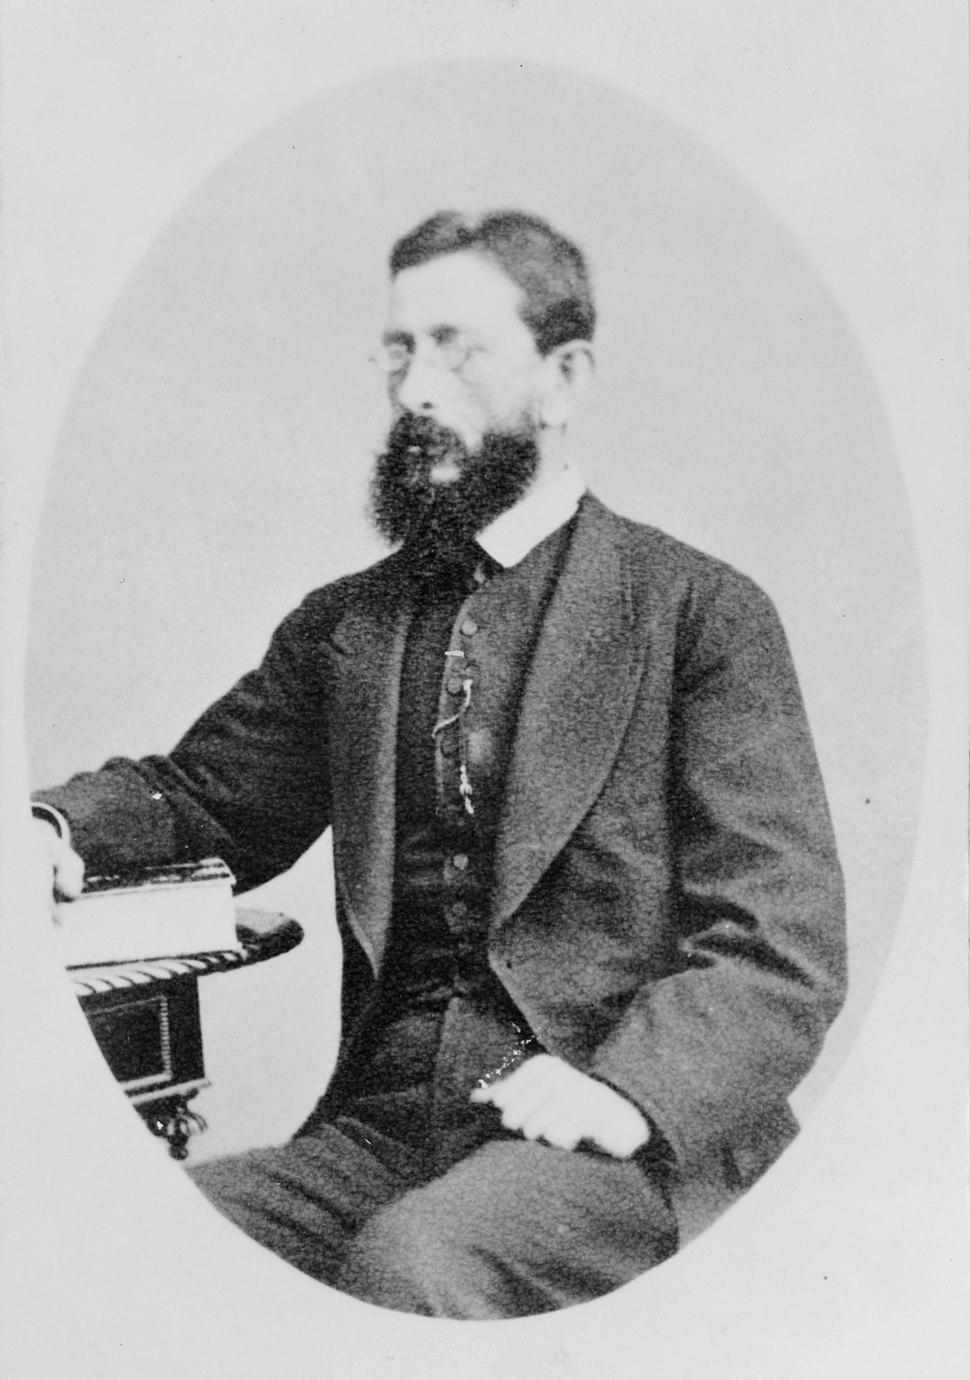 Mariano Escobedo